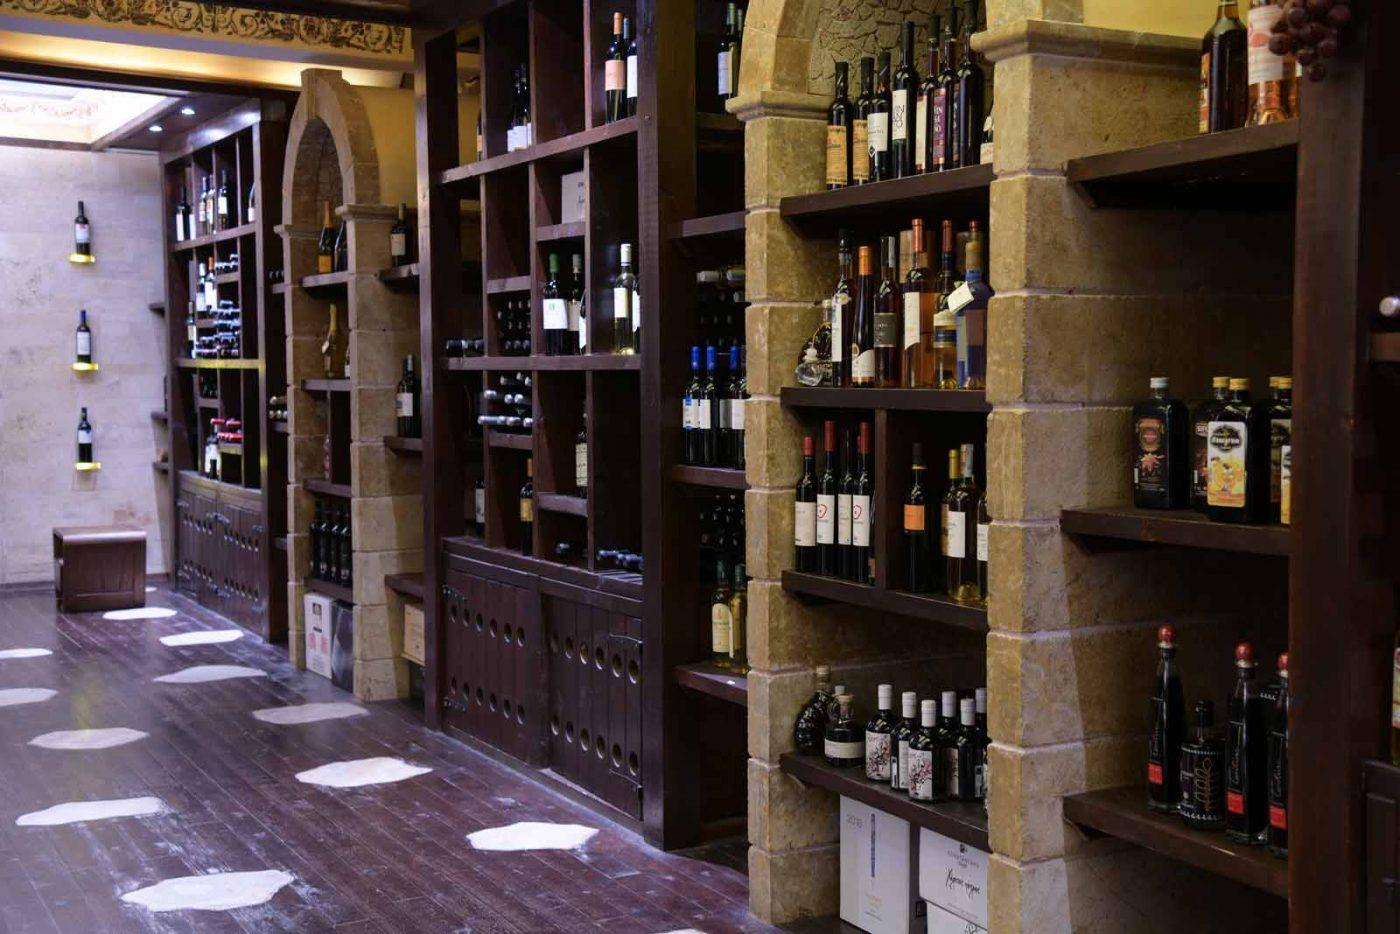 Cava Idea wine cellar